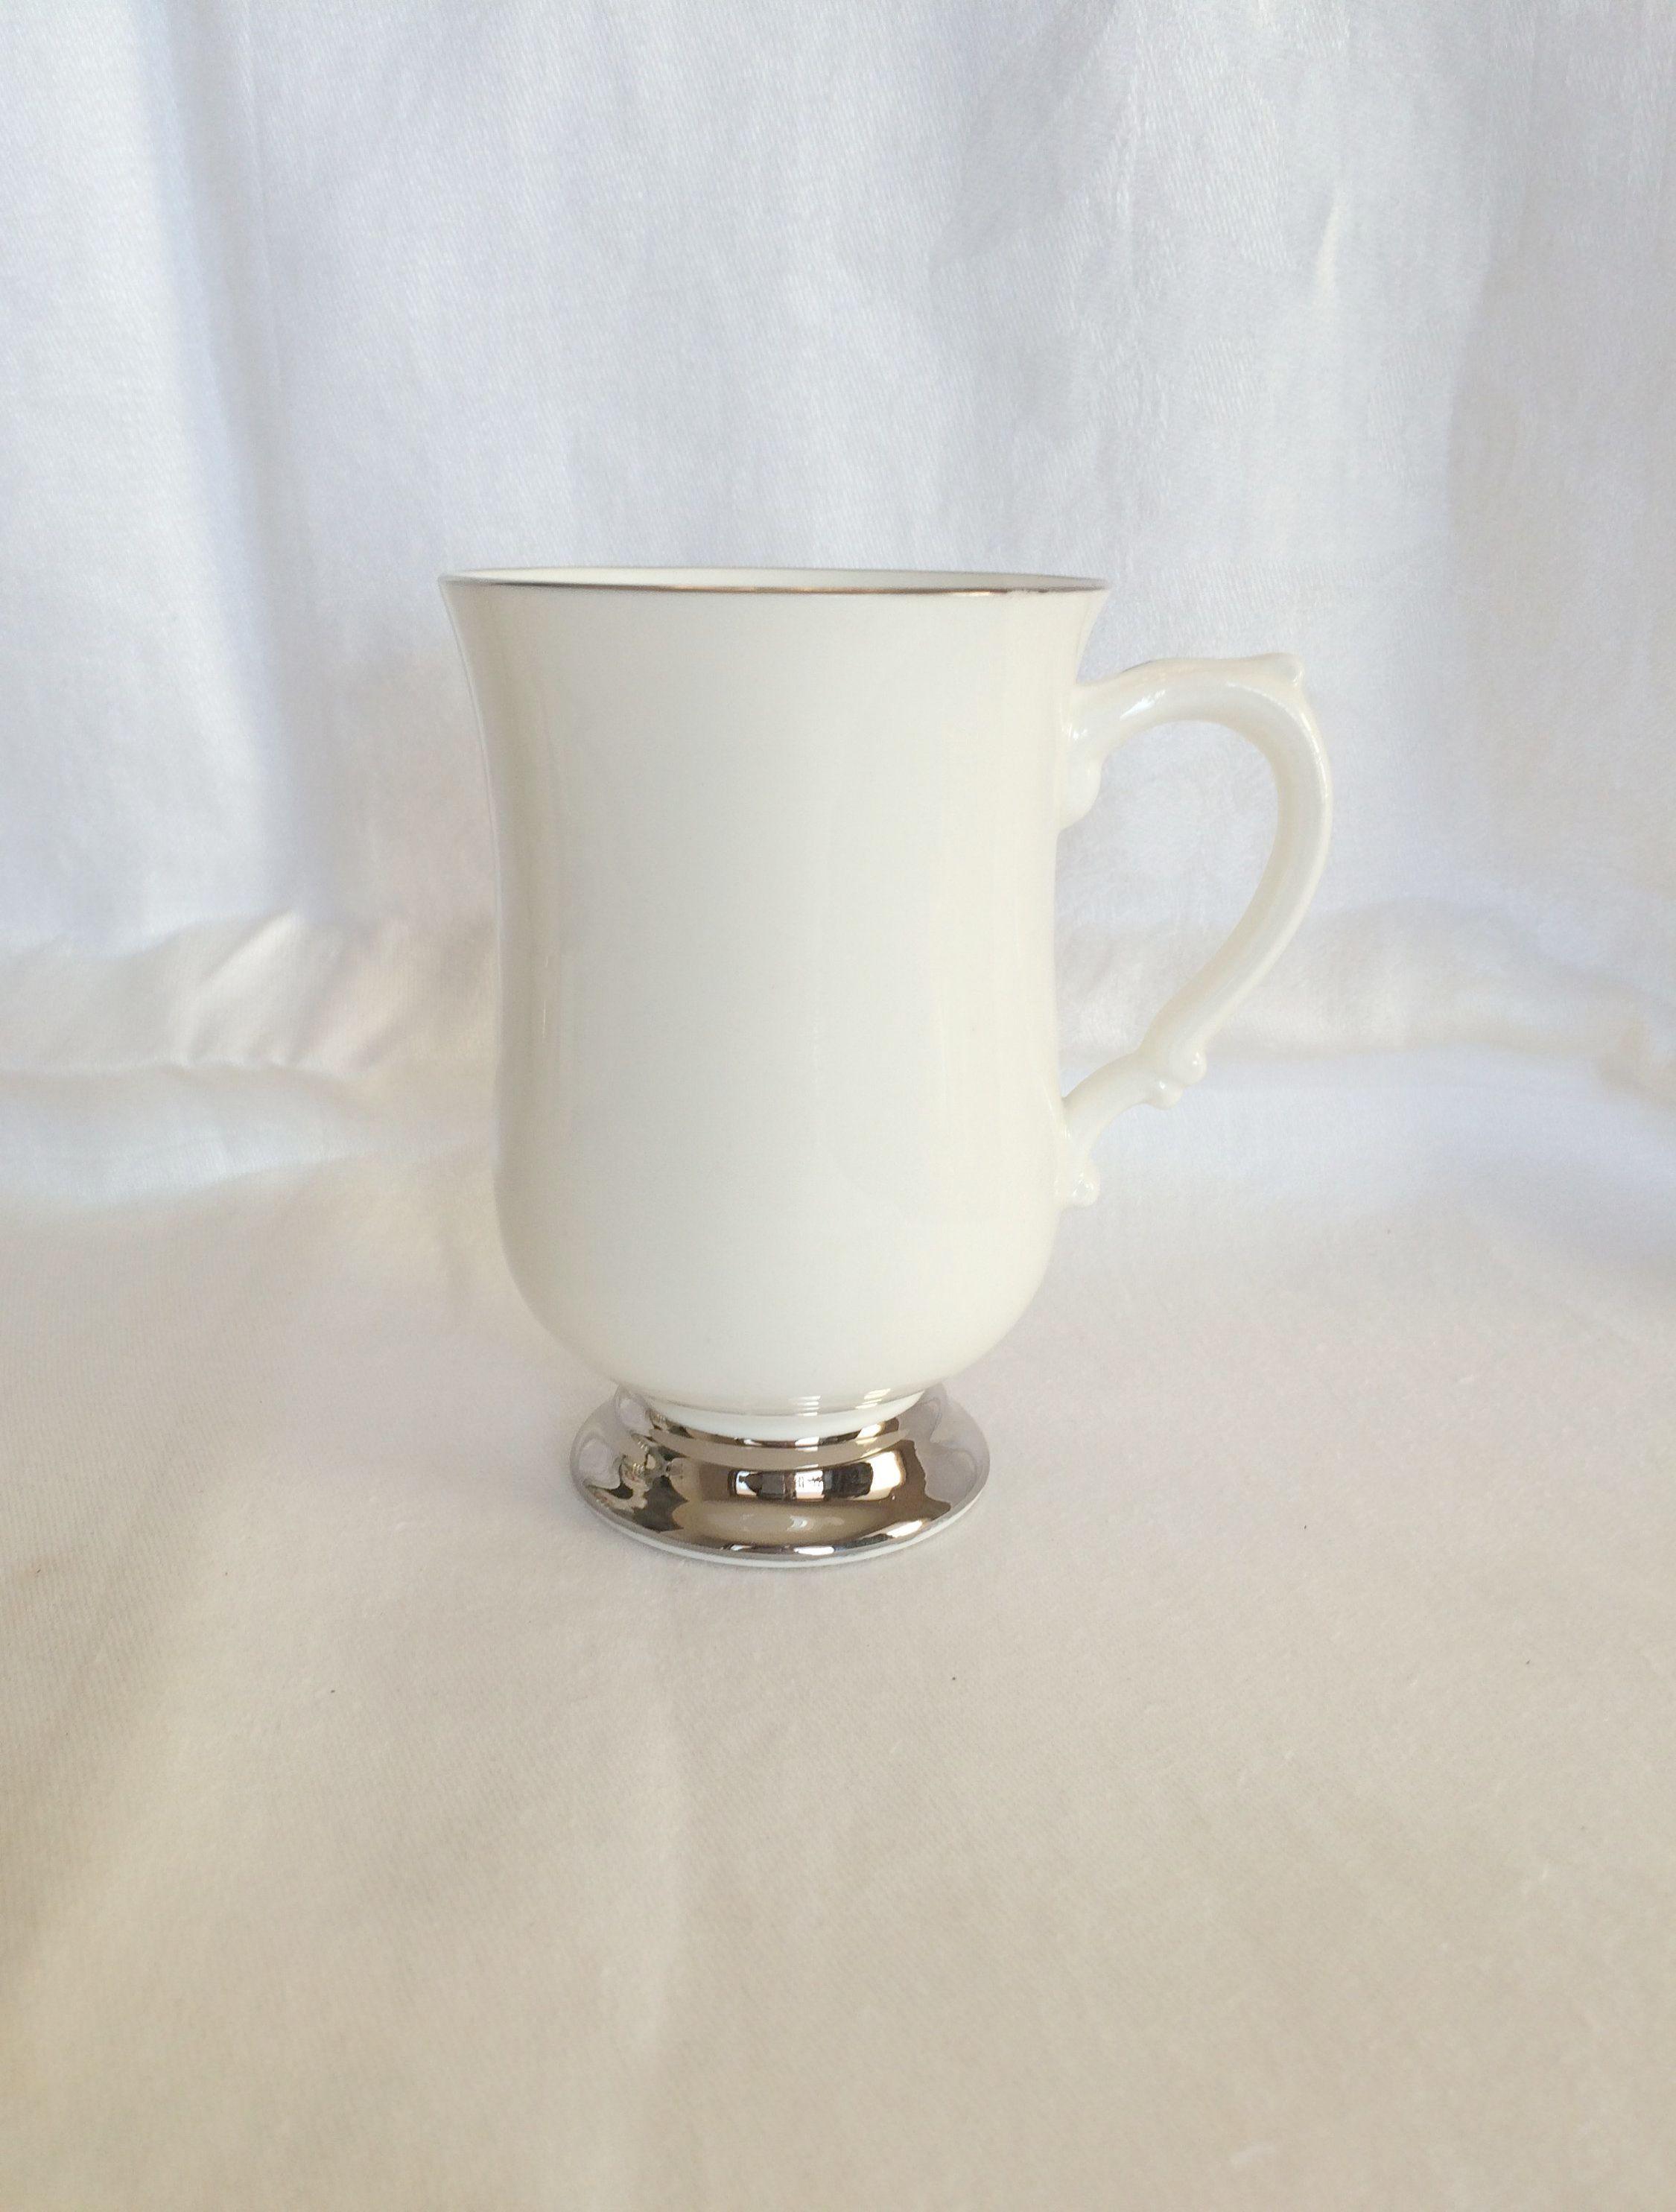 Coffee Table Protector Beyond Coffee Near Me Belmont Coffee Near Me Please Vintage Coffee Tea Cups Vintage Vintage Tea